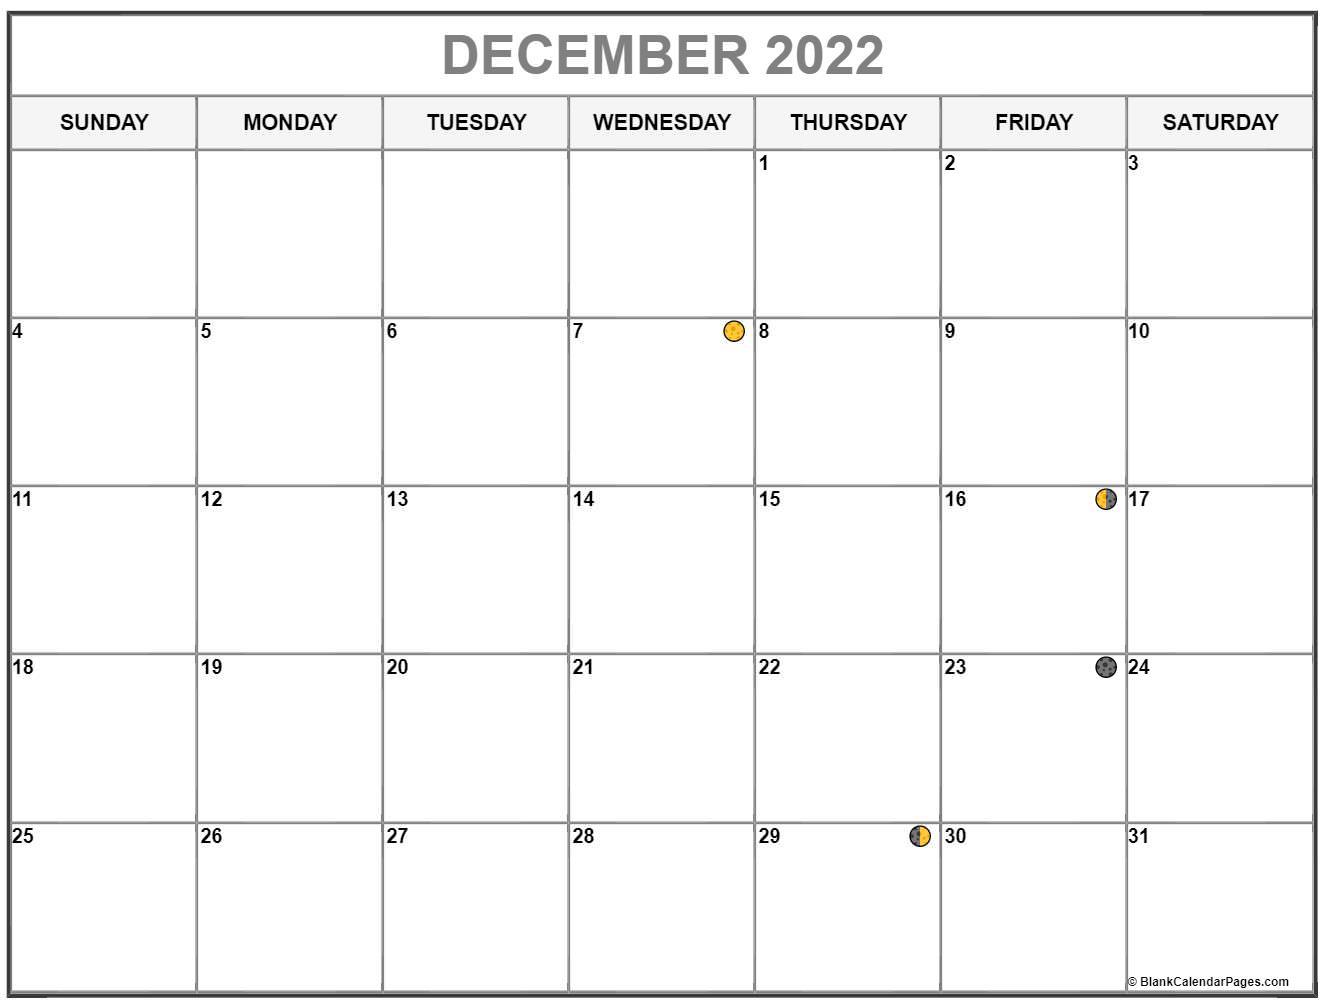 December 2022 lunar calendar. Moon phases with USA holidays